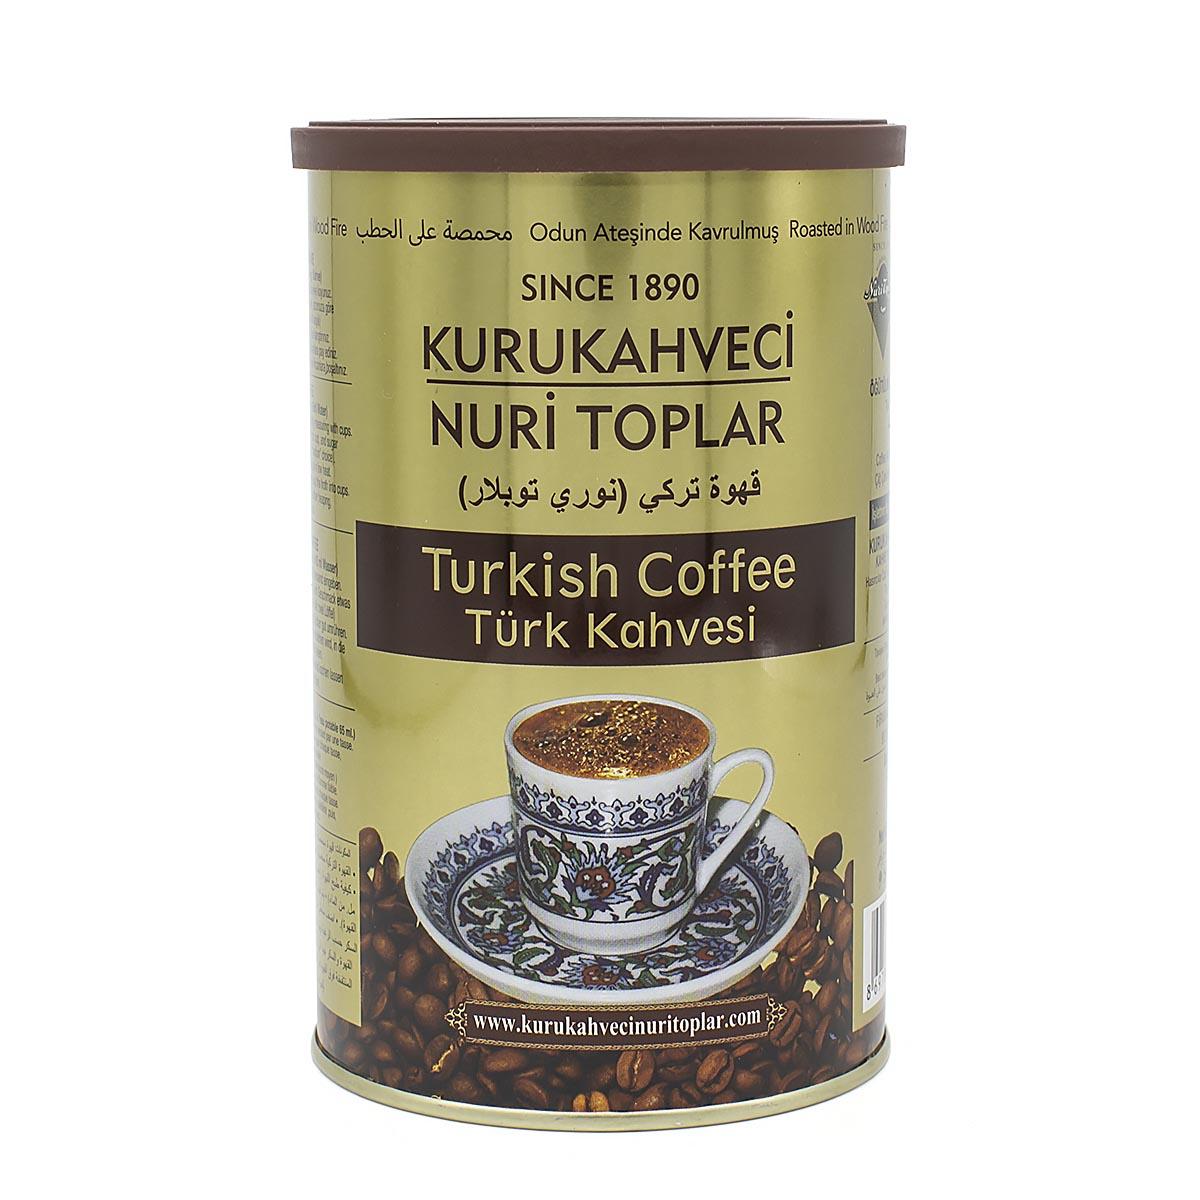 Кофе молотый Kurukahveci Nuri Toplar, 250 г